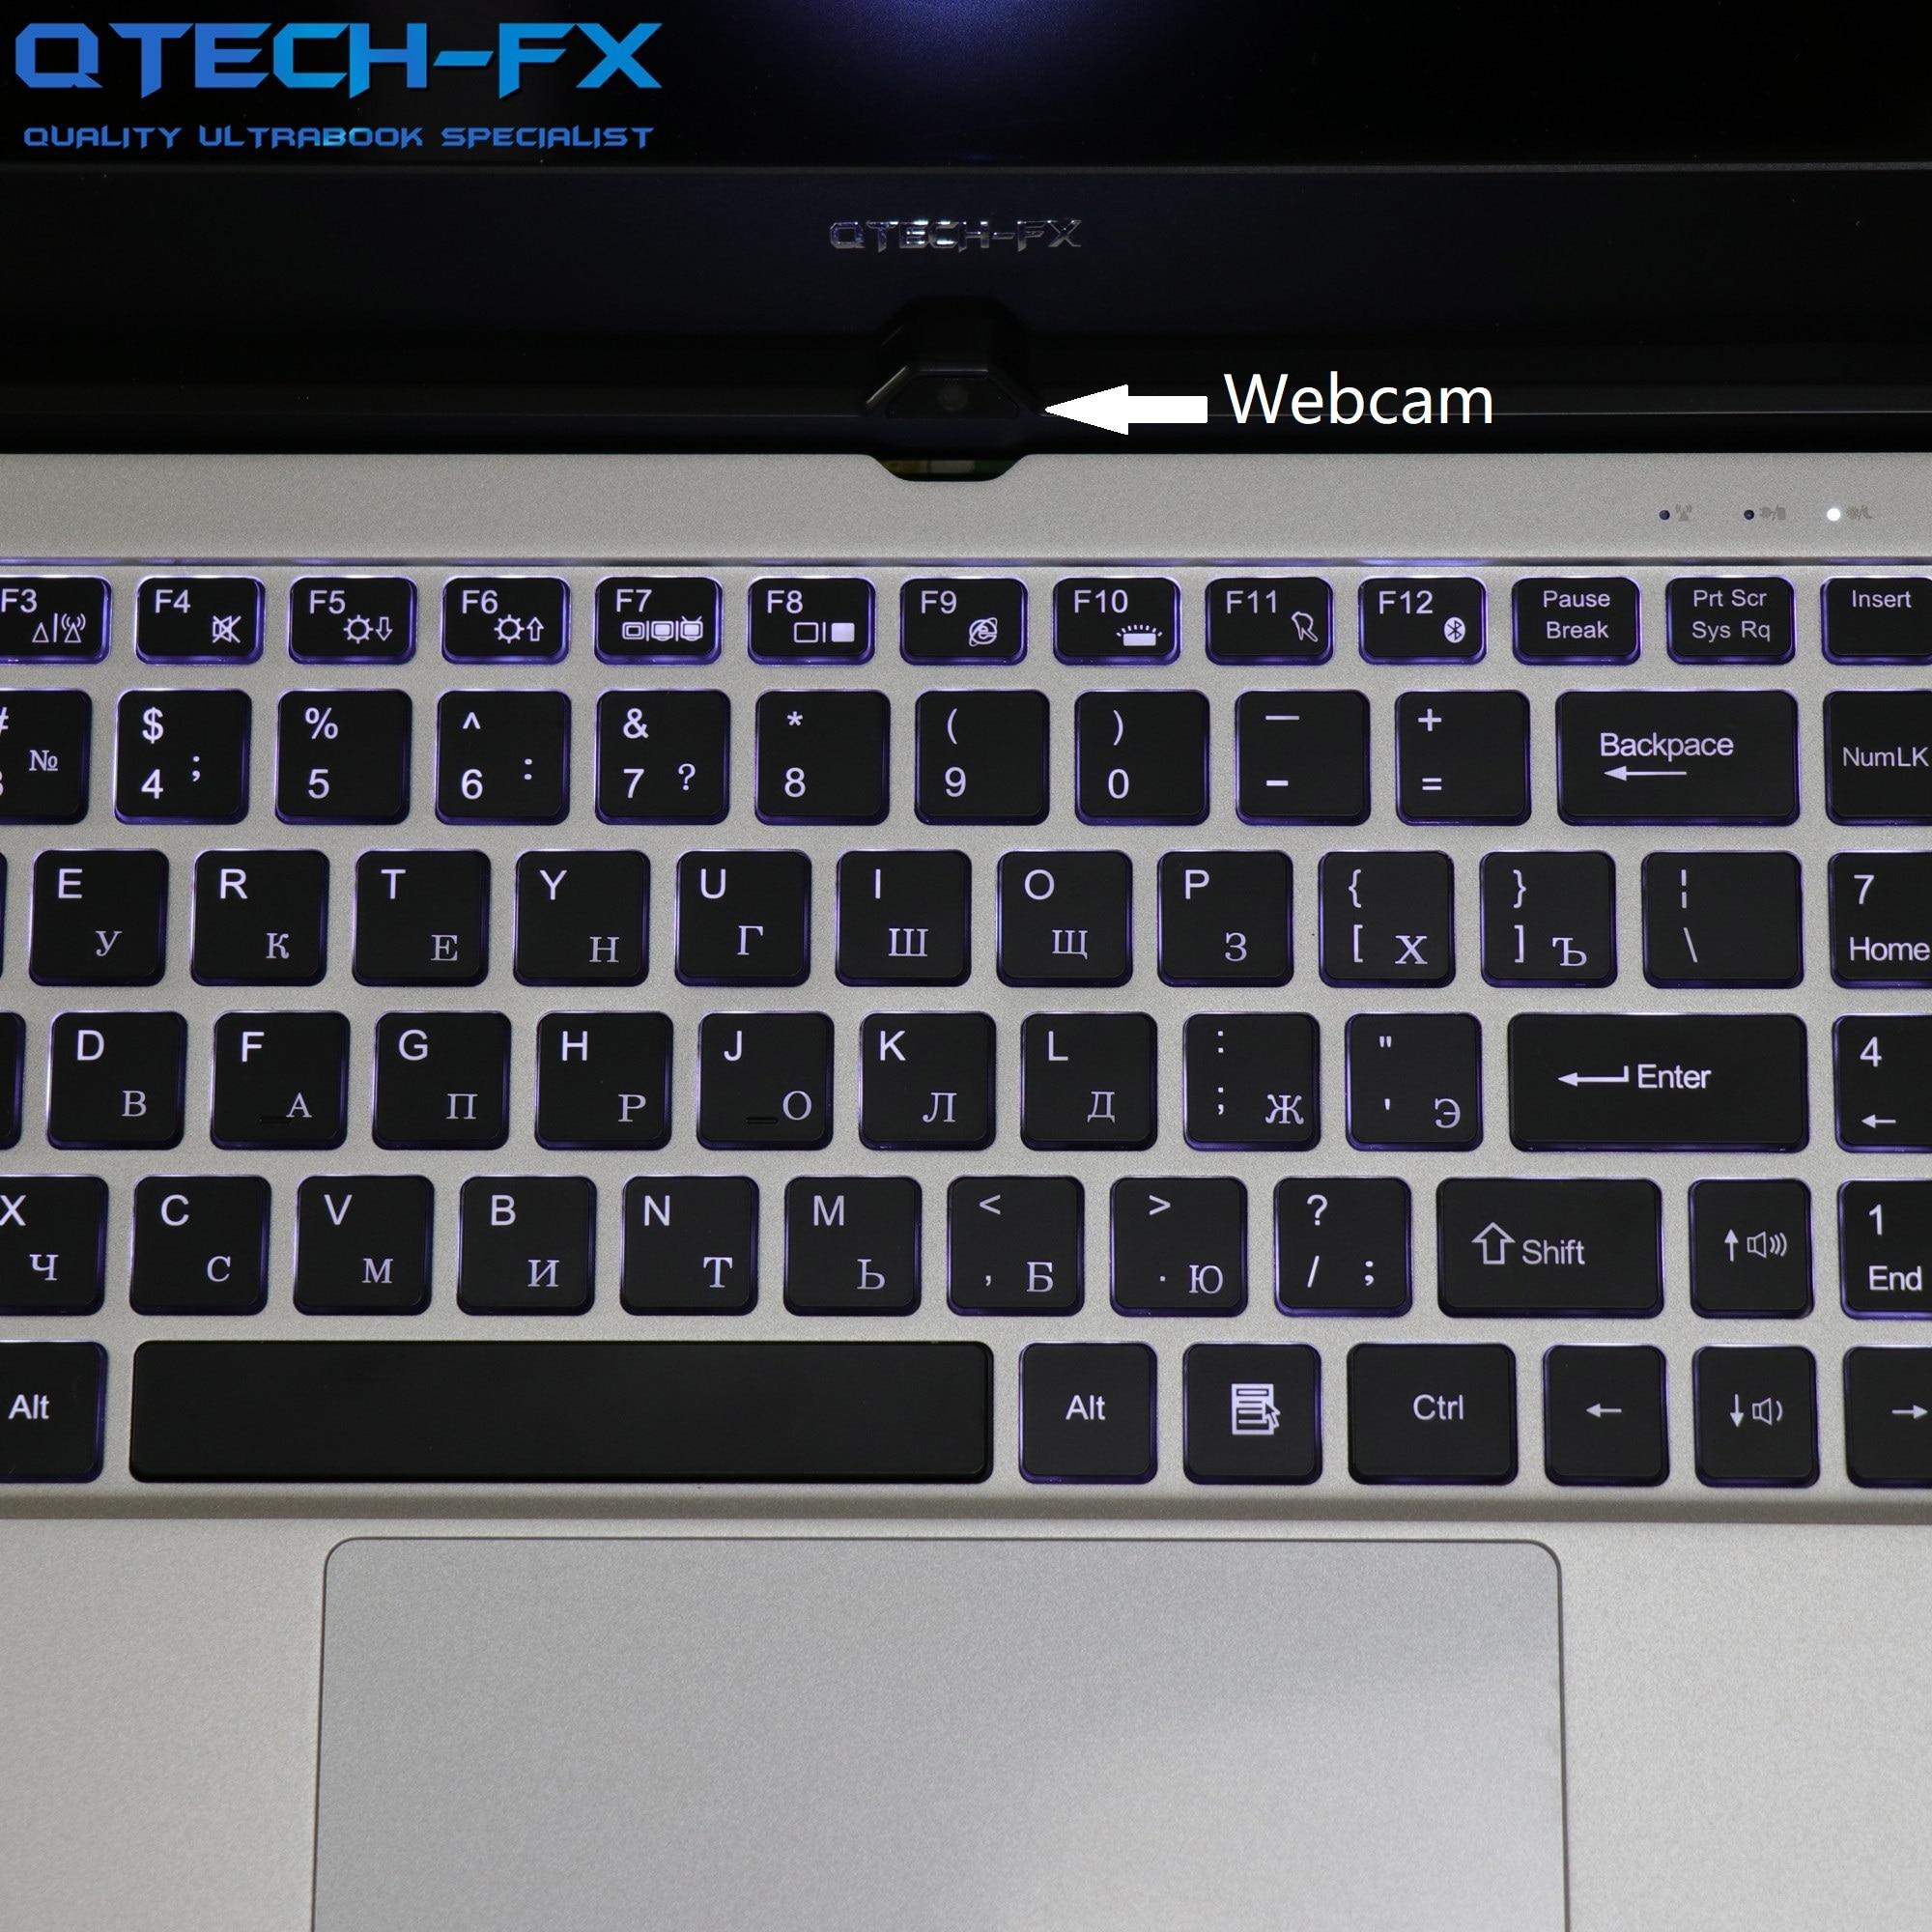 Metal i7 1TB SSD 16GB RAM 512G 15.6 Laptop Intel CPU Windows10 Game Office Arabic Hebrew AZERTY Spanish Russian Keyboard Backlit